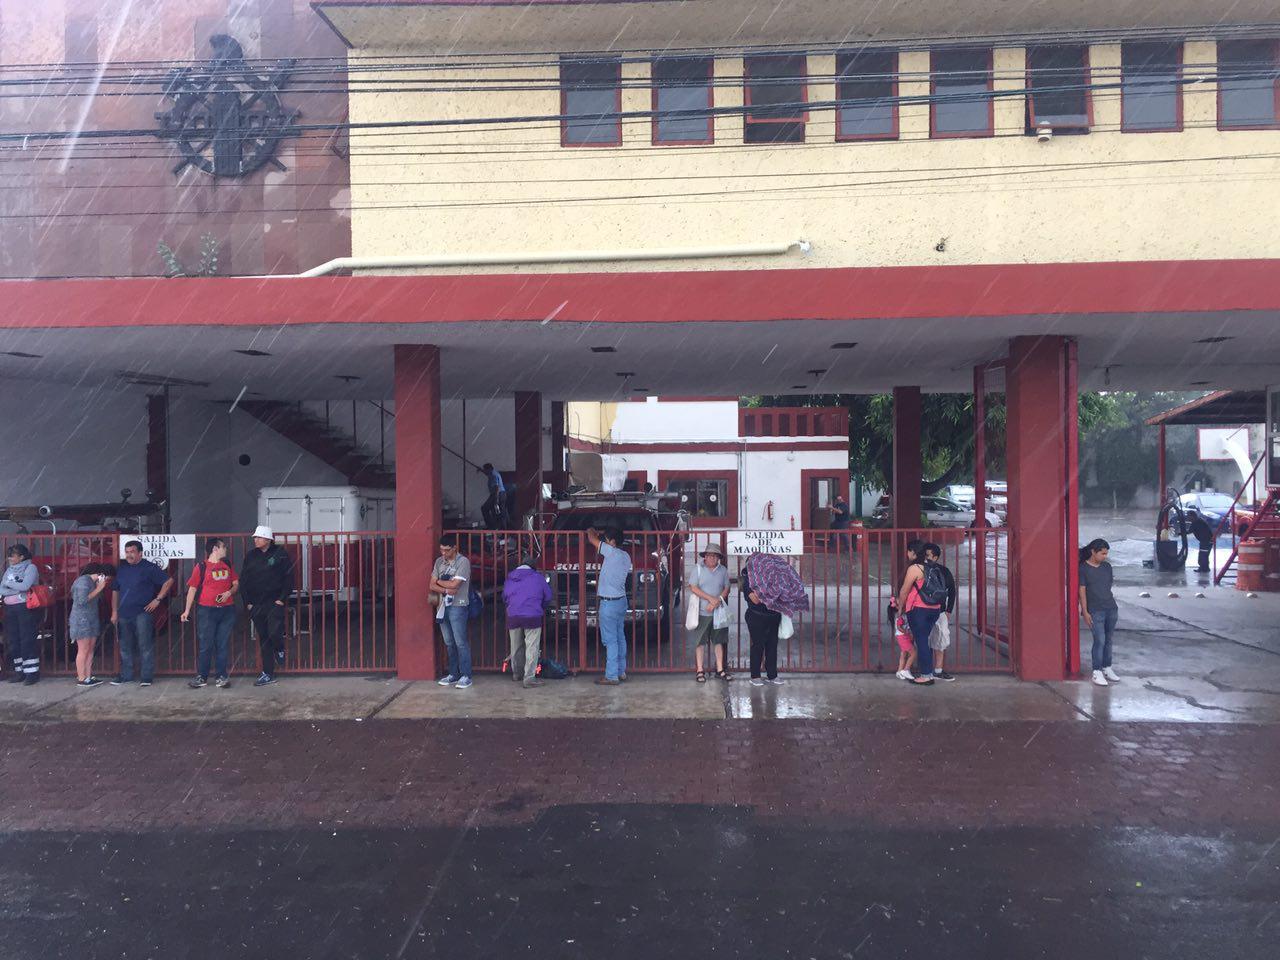 Pronostica SMN lluvias fuertes para Querétaro este viernes